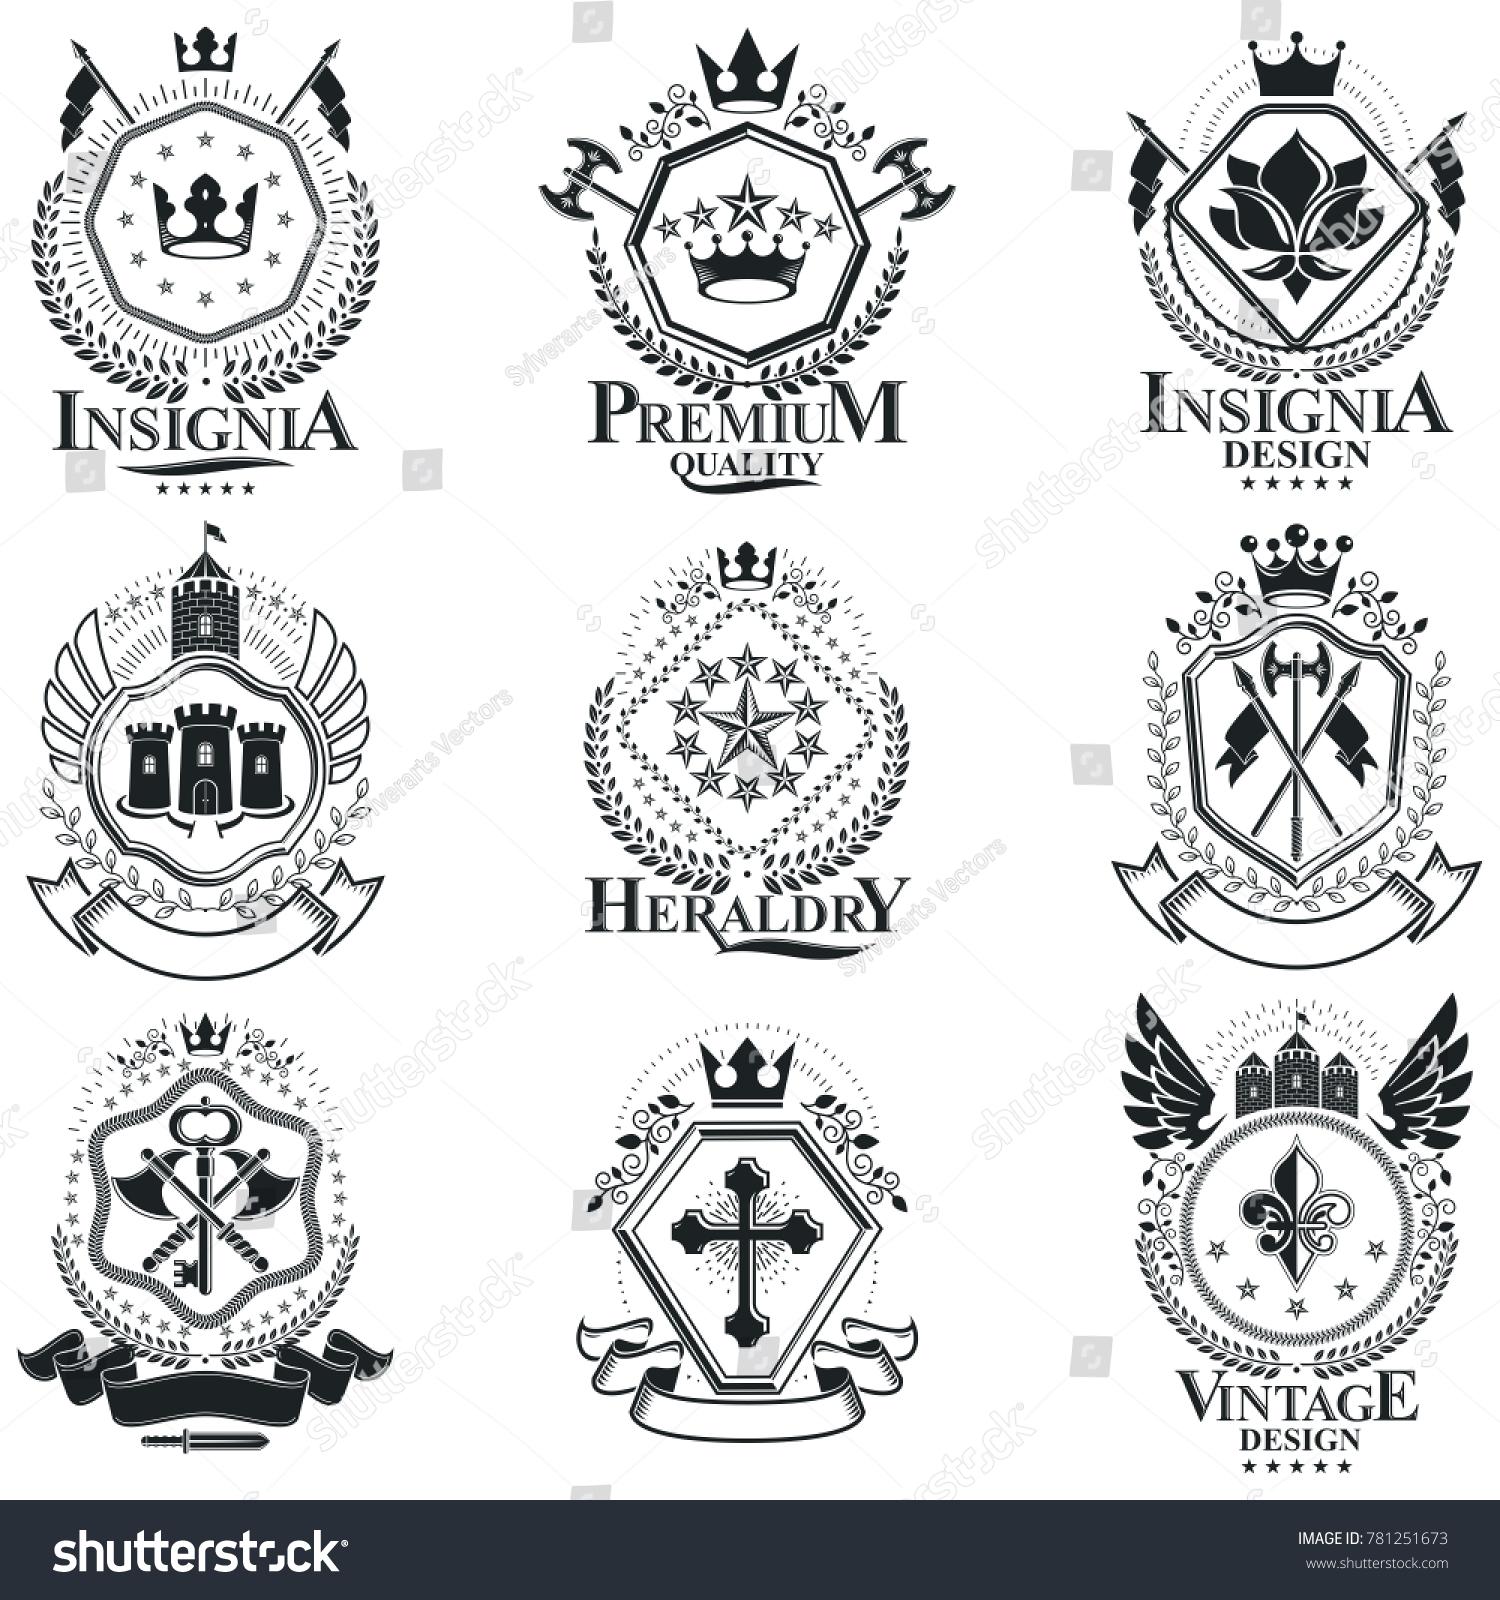 Heraldic coat arms vintage emblems classy stock illustration heraldic coat of arms vintage emblems classy high quality symbolic illustrations collection set biocorpaavc Images